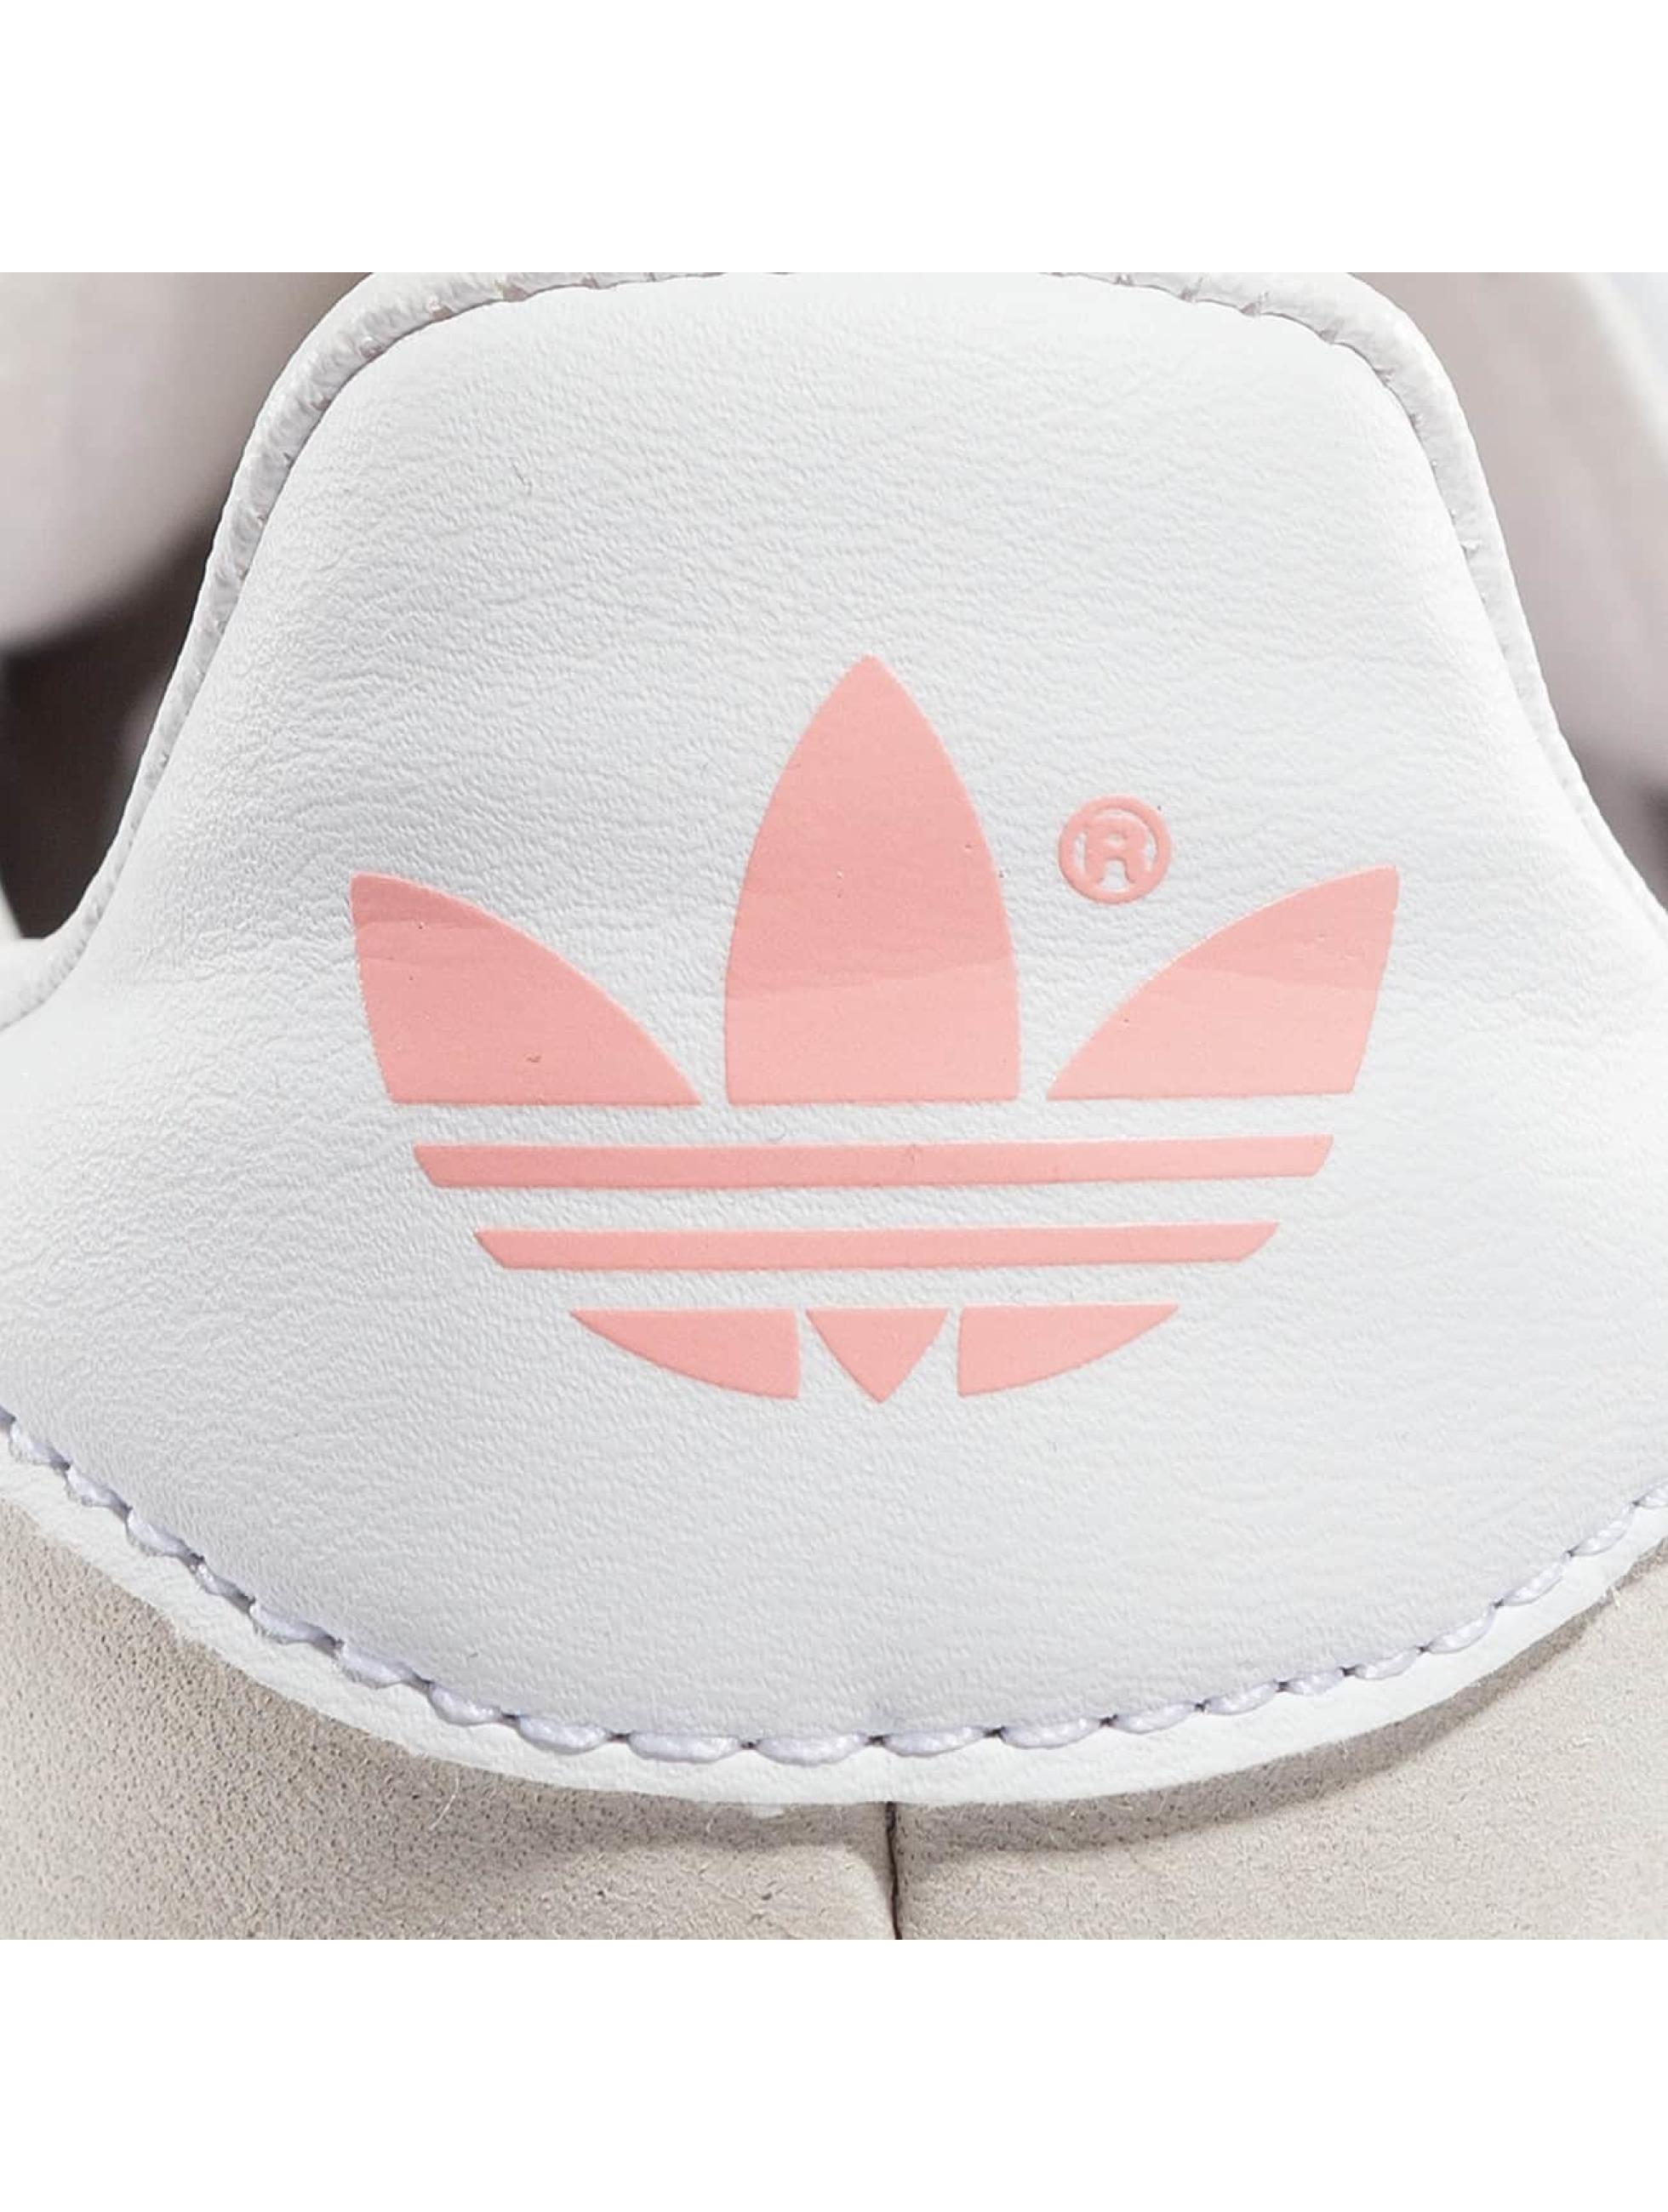 adidas originals Sneaker Gazelle orange